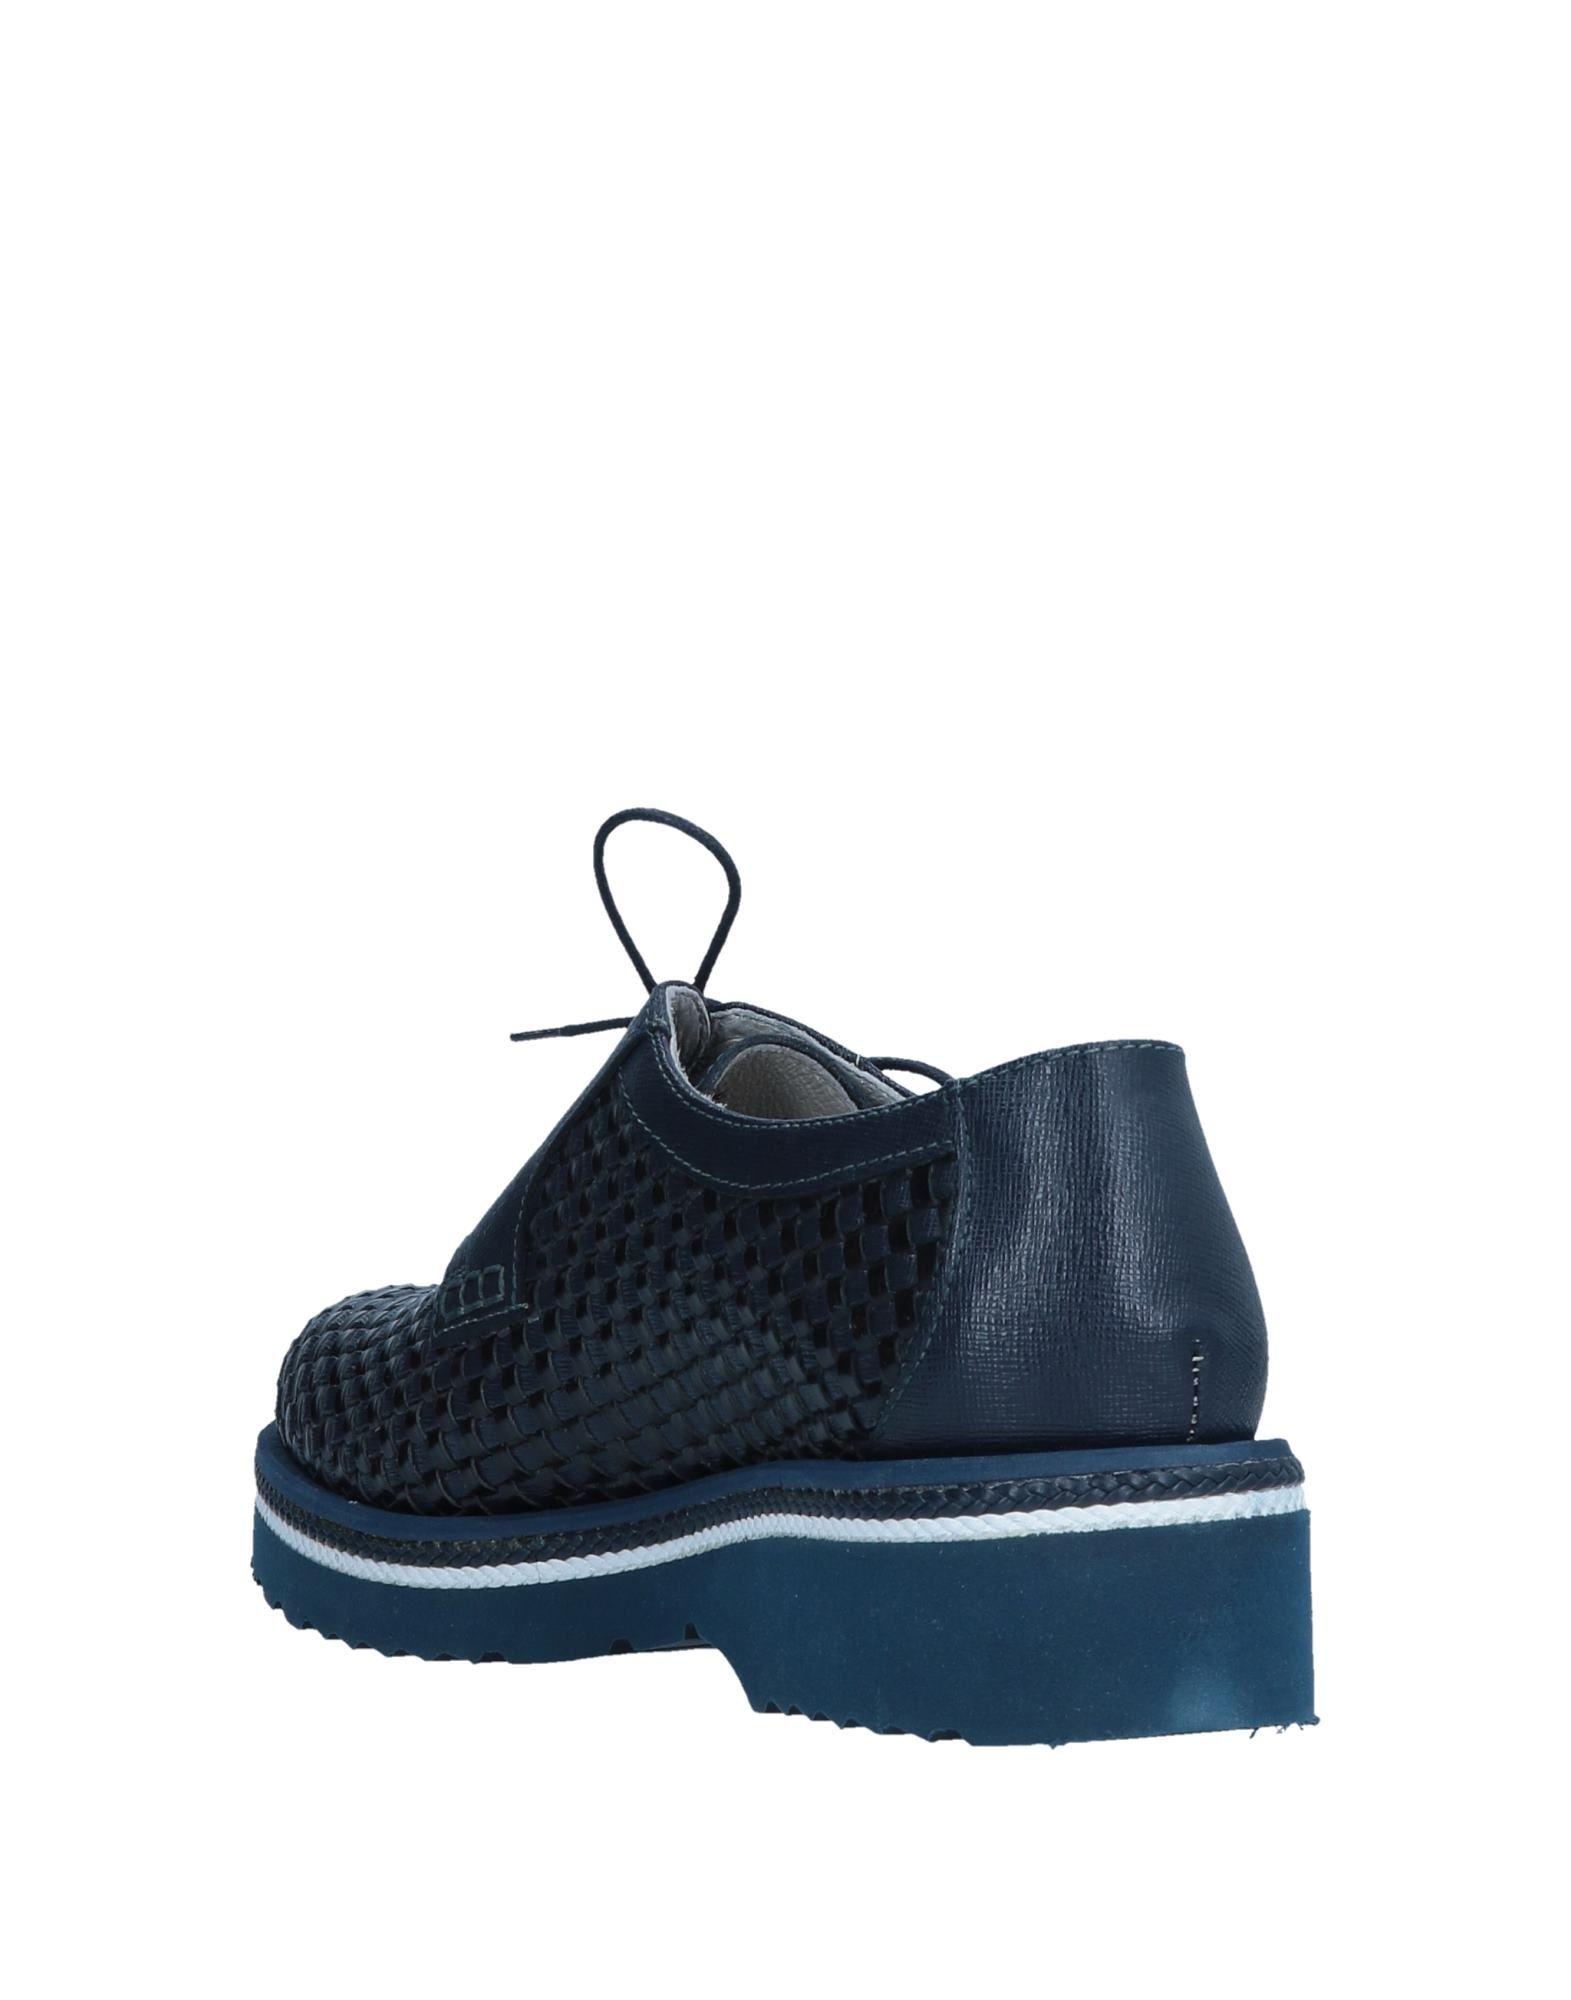 Gut um billige Schuhe  zu tragenMarechiaro 1962 Schnürschuhe Damen  Schuhe 11548321GS 0a49bb